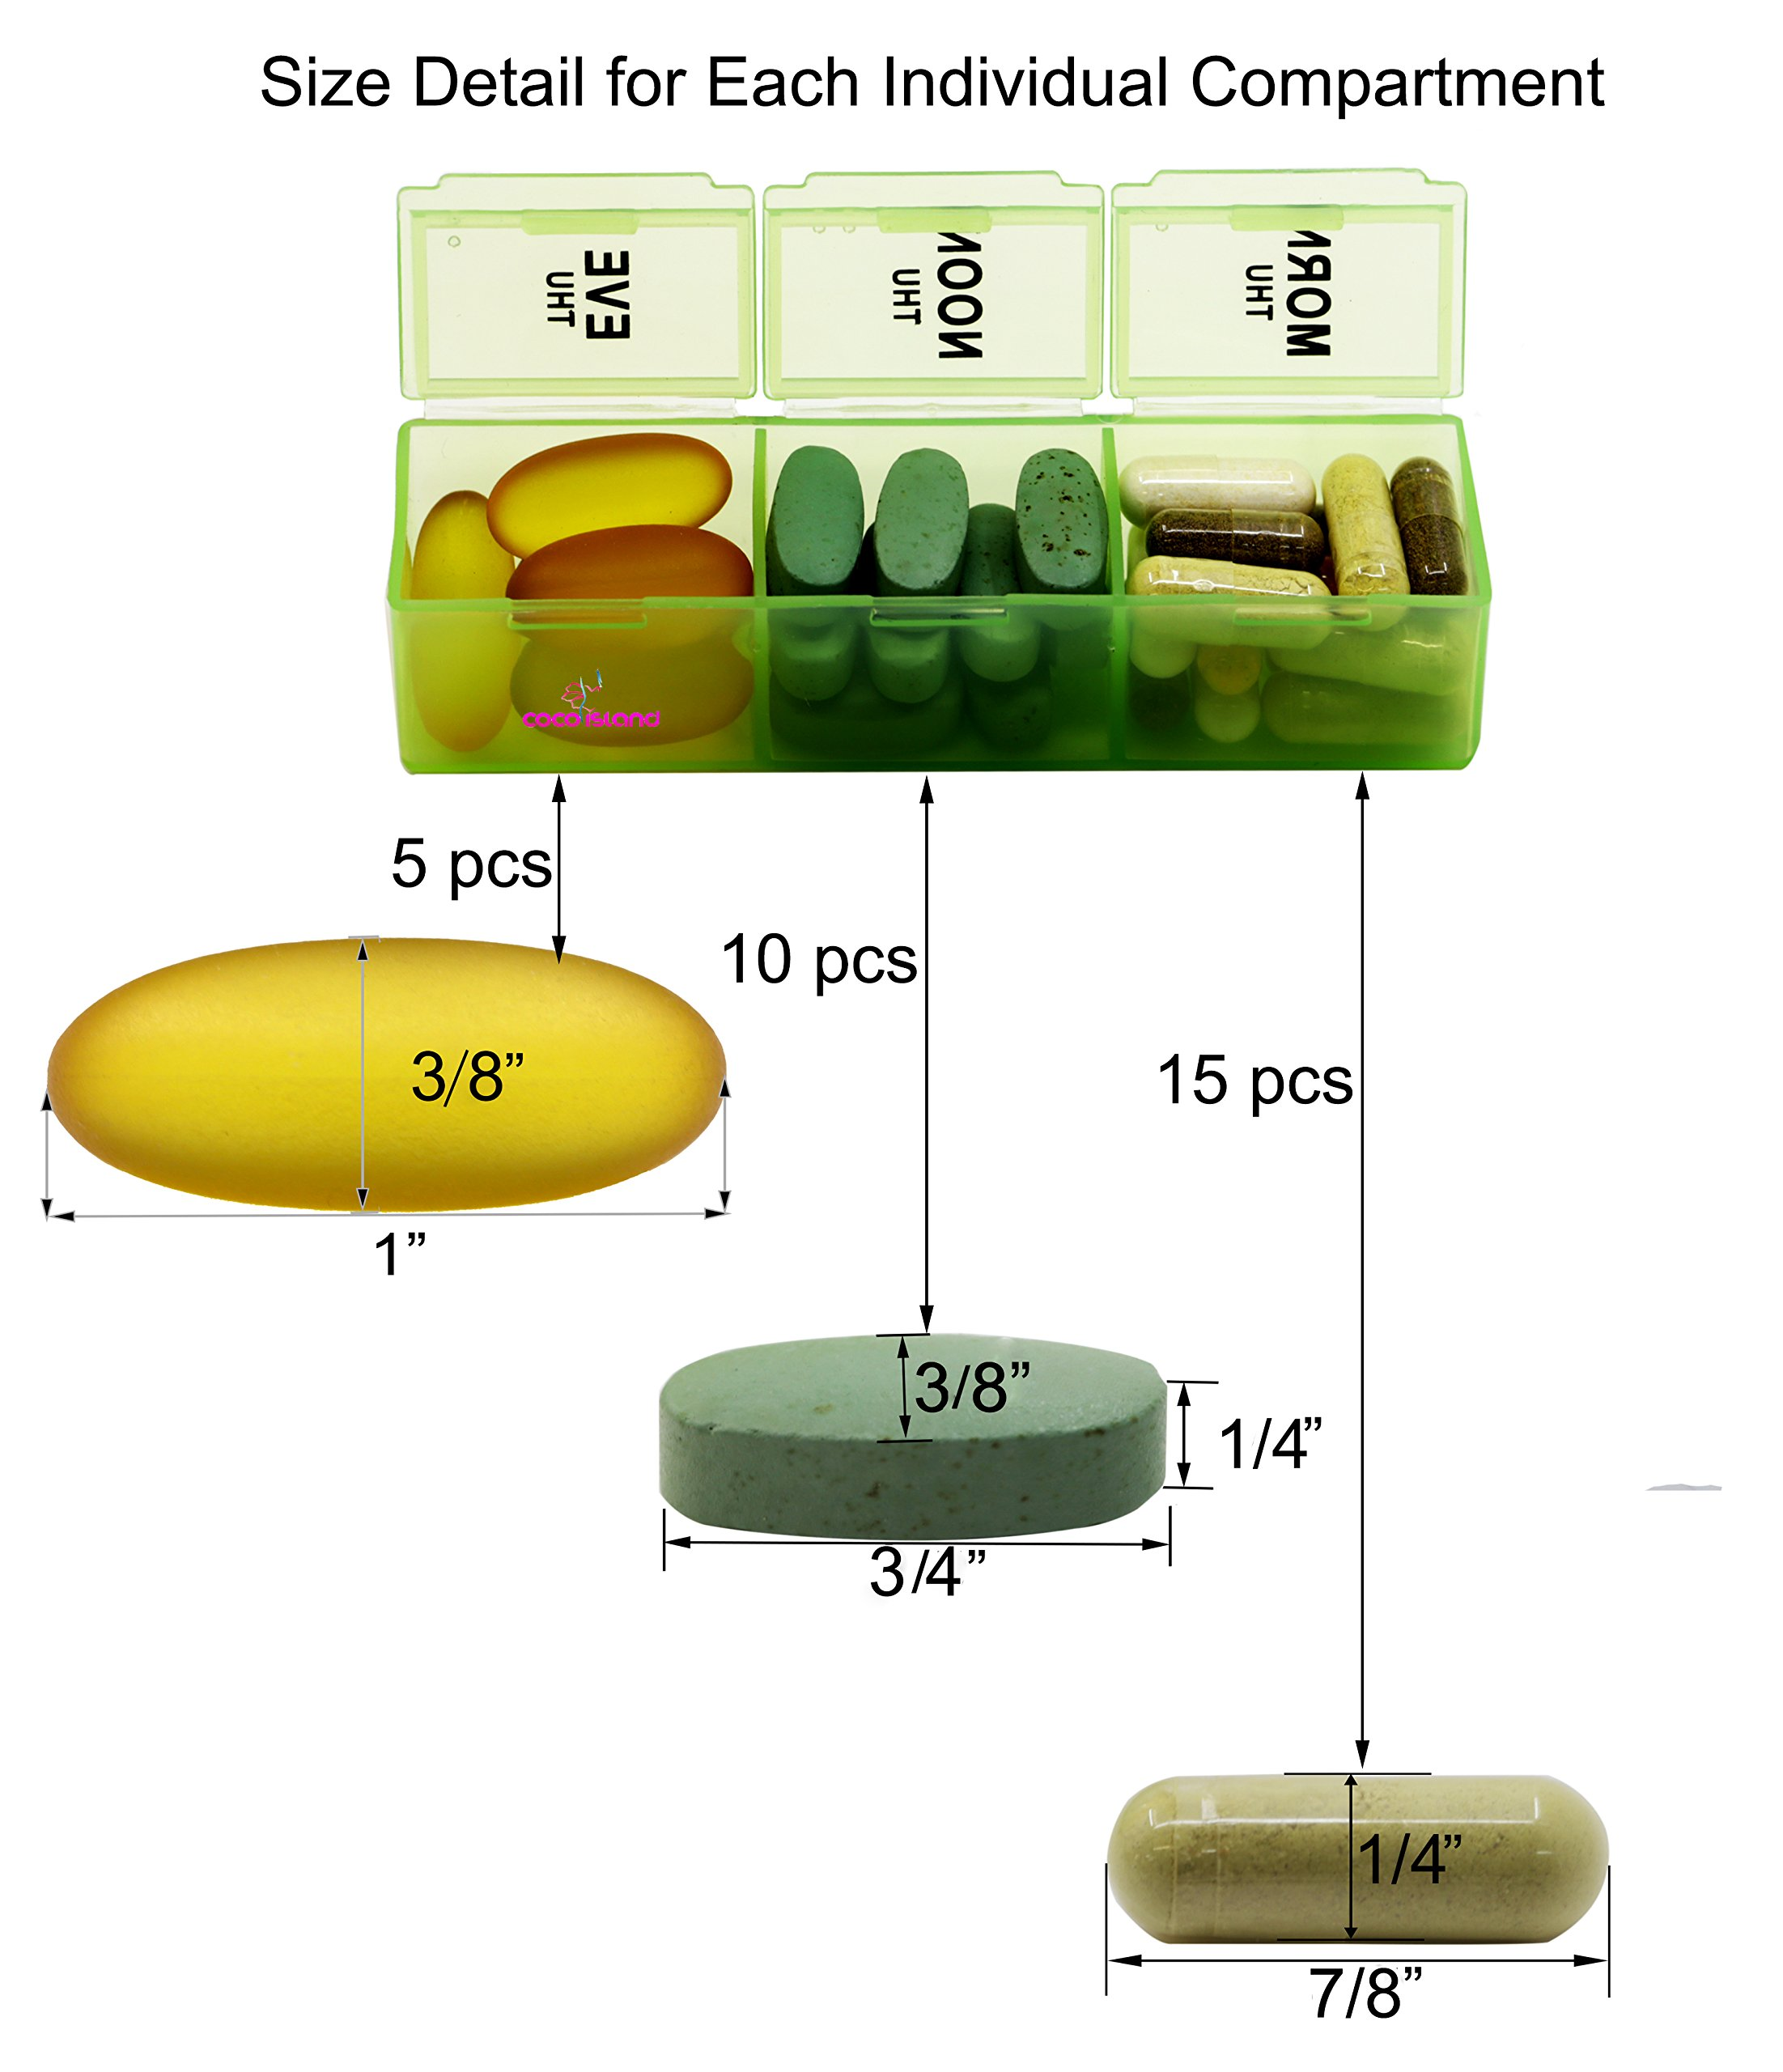 Pill Organizer, Medicine Organizer, Vitamin Organizer (Weekly - 24 Compartment) (818) by CoCo Island (Image #3)